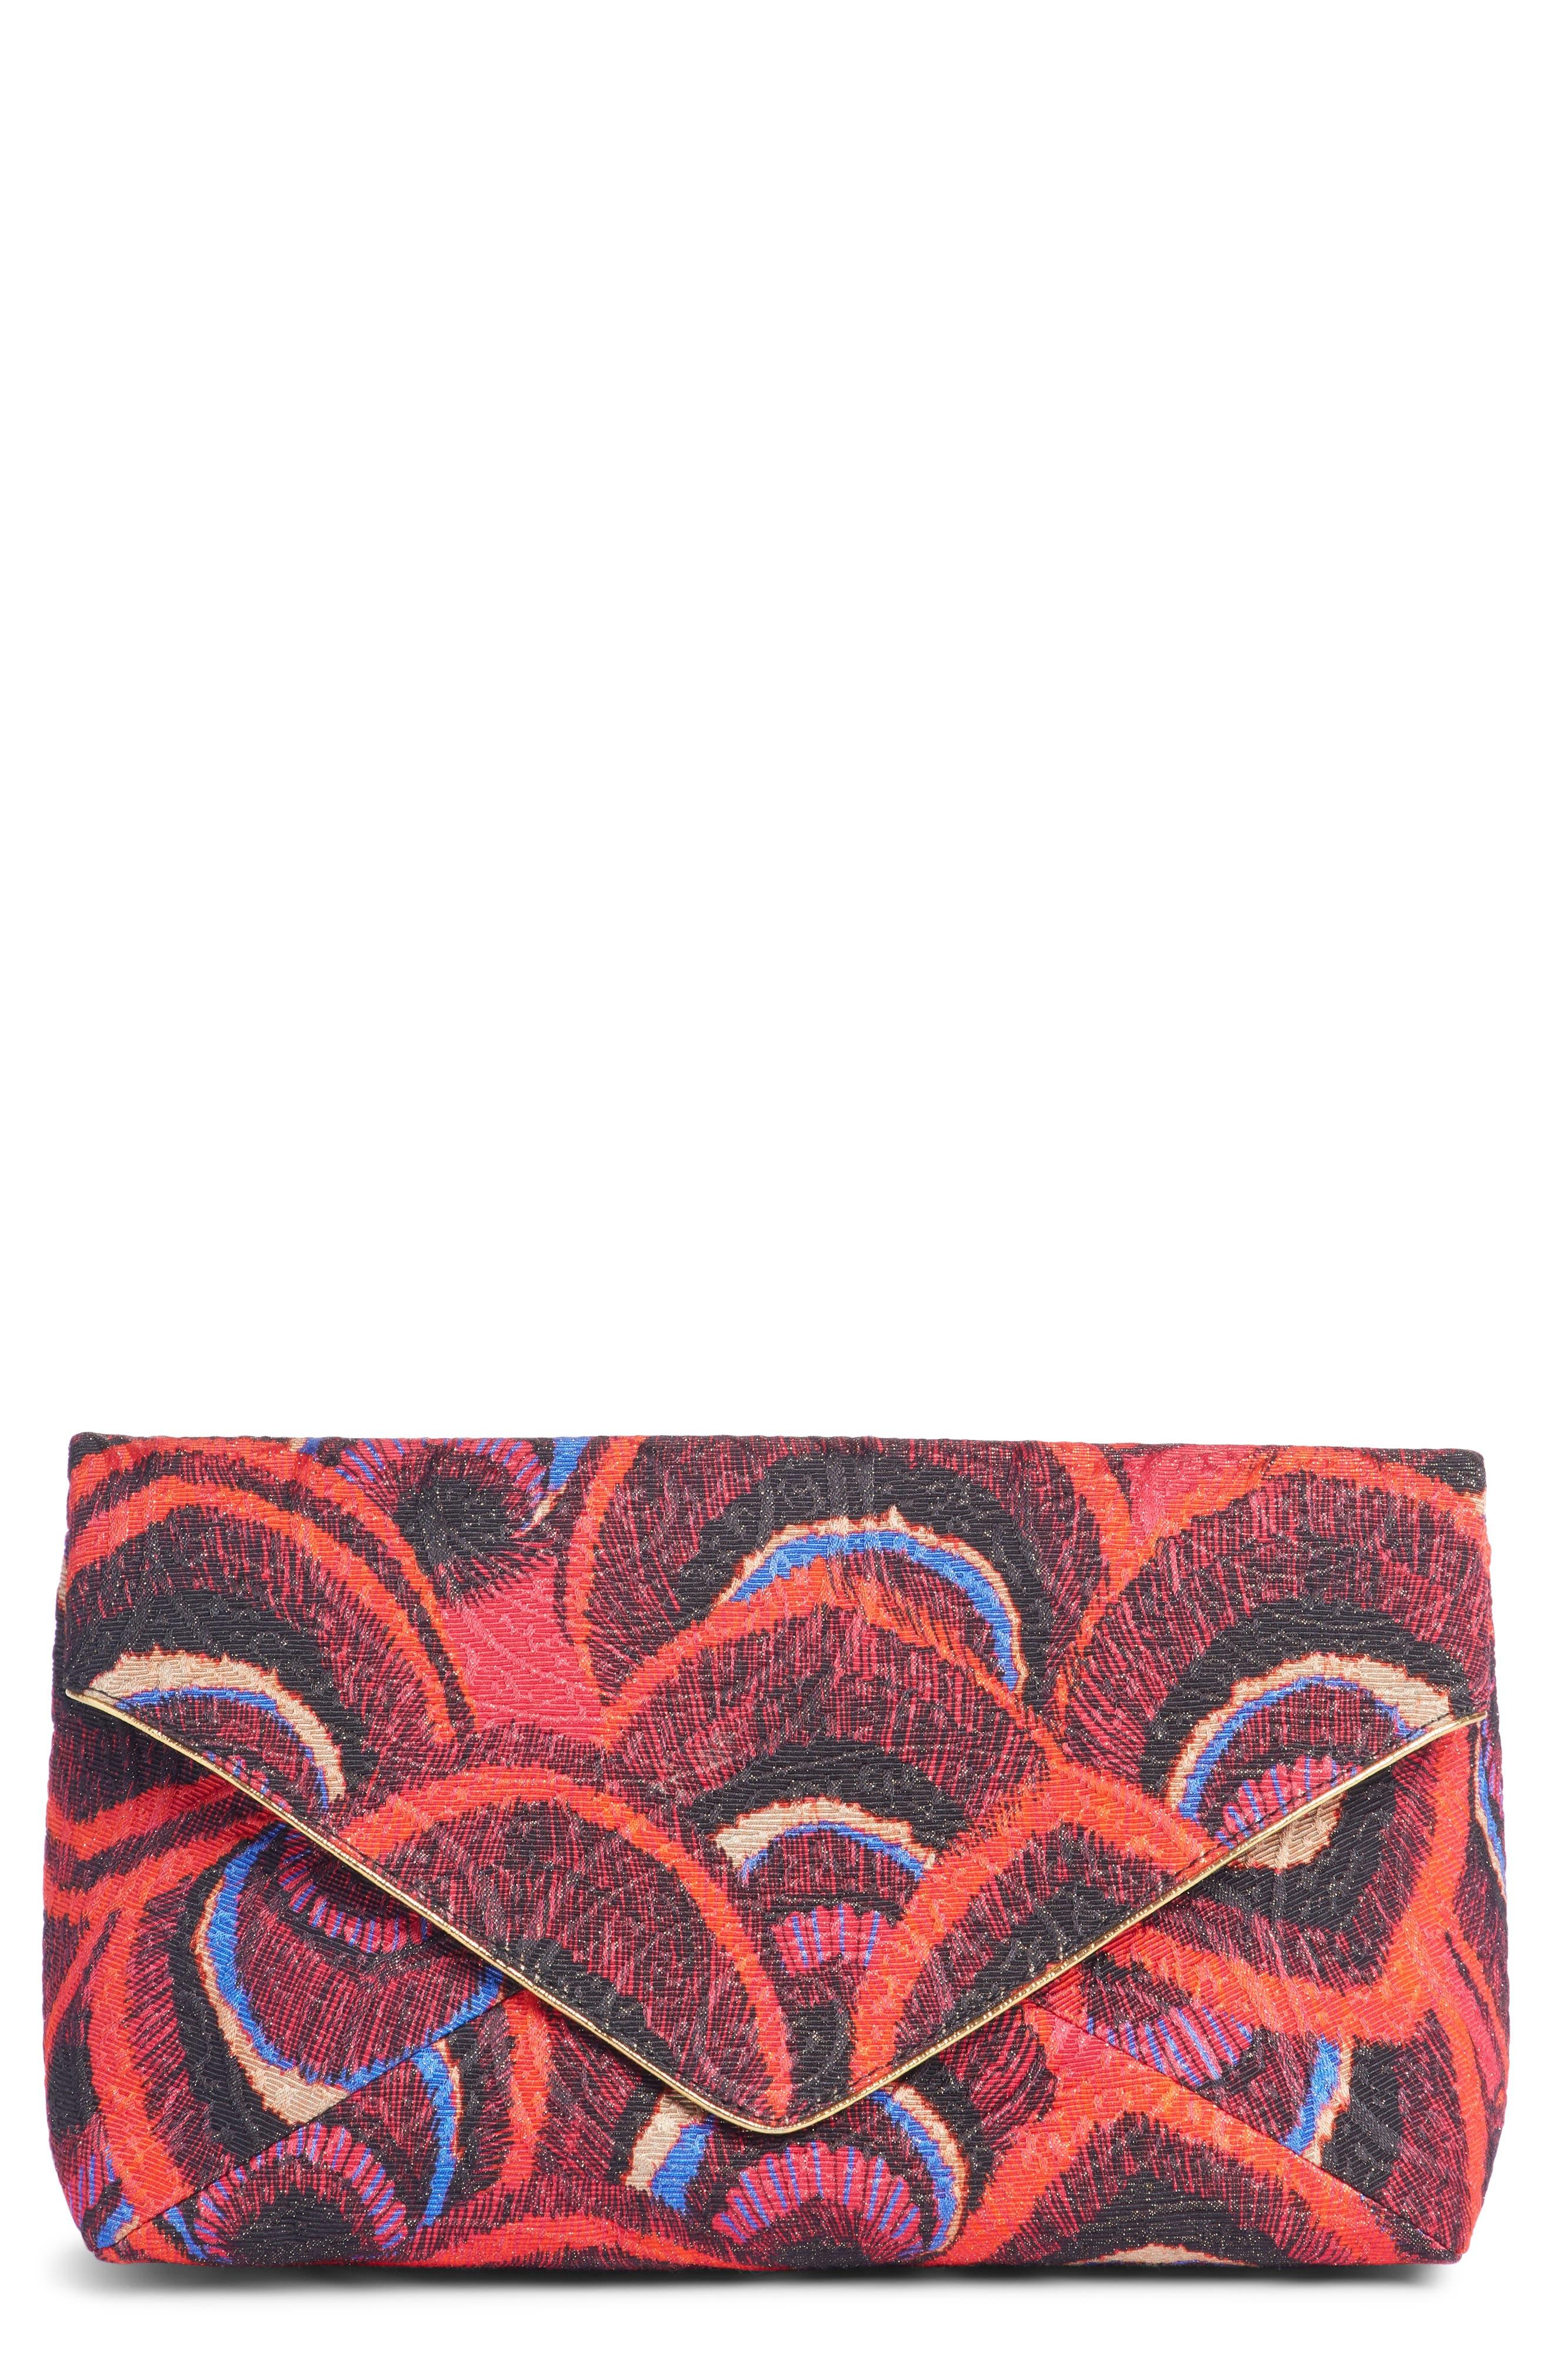 Peacock Jacquard Envelope Clutch,                             Main thumbnail 1, color,                             CHERRY